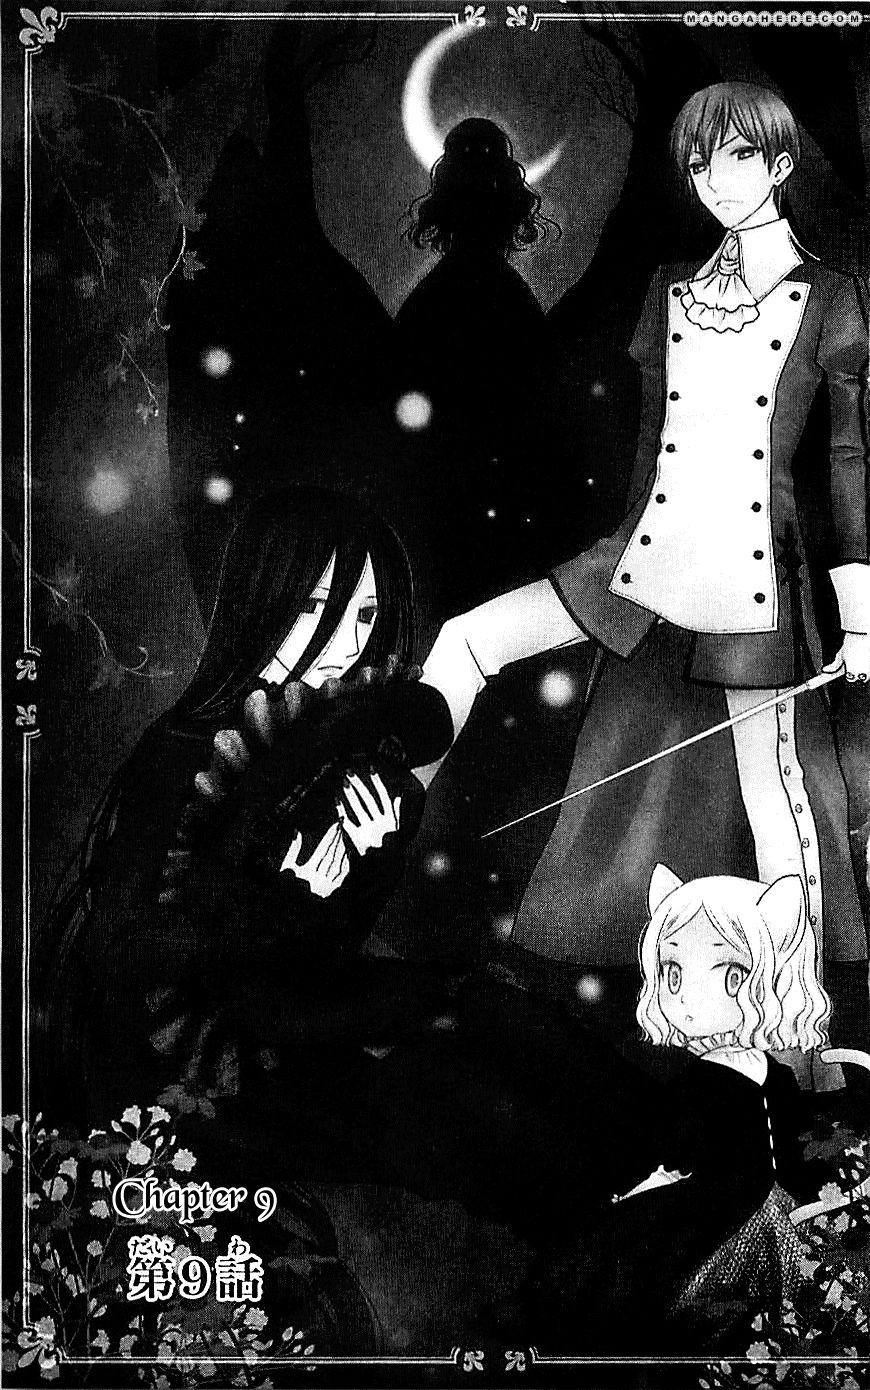 Liselotte to Majo no Mori 9 Page 1